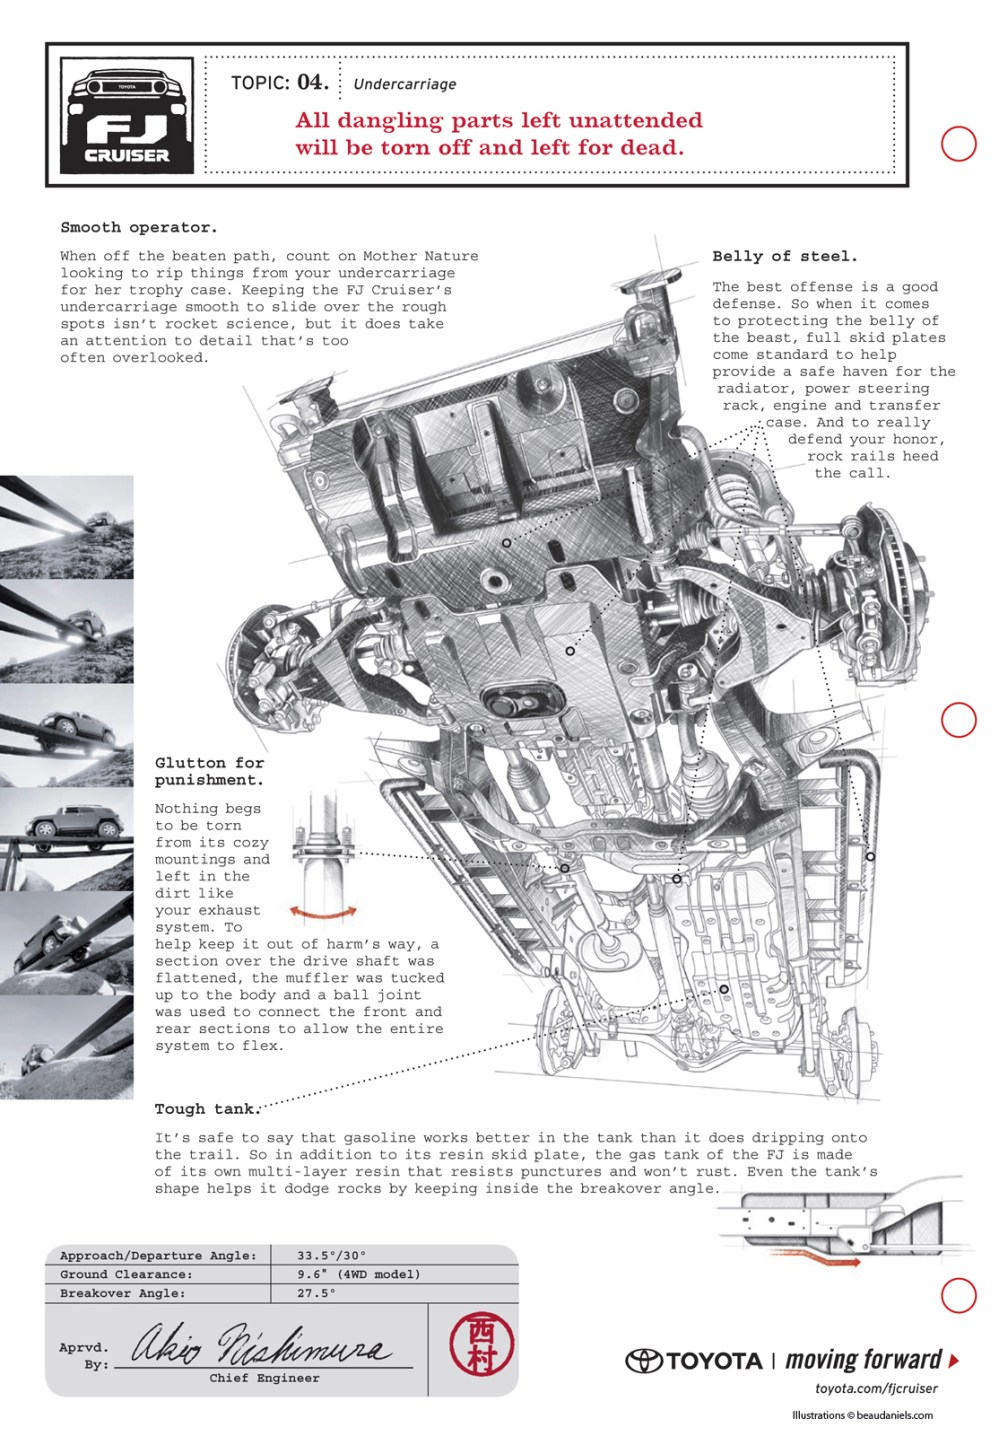 medium resolution of fj cruiser motor diagram data schematic diagram fj cruiser engine part diagram wiring library fj cruiser